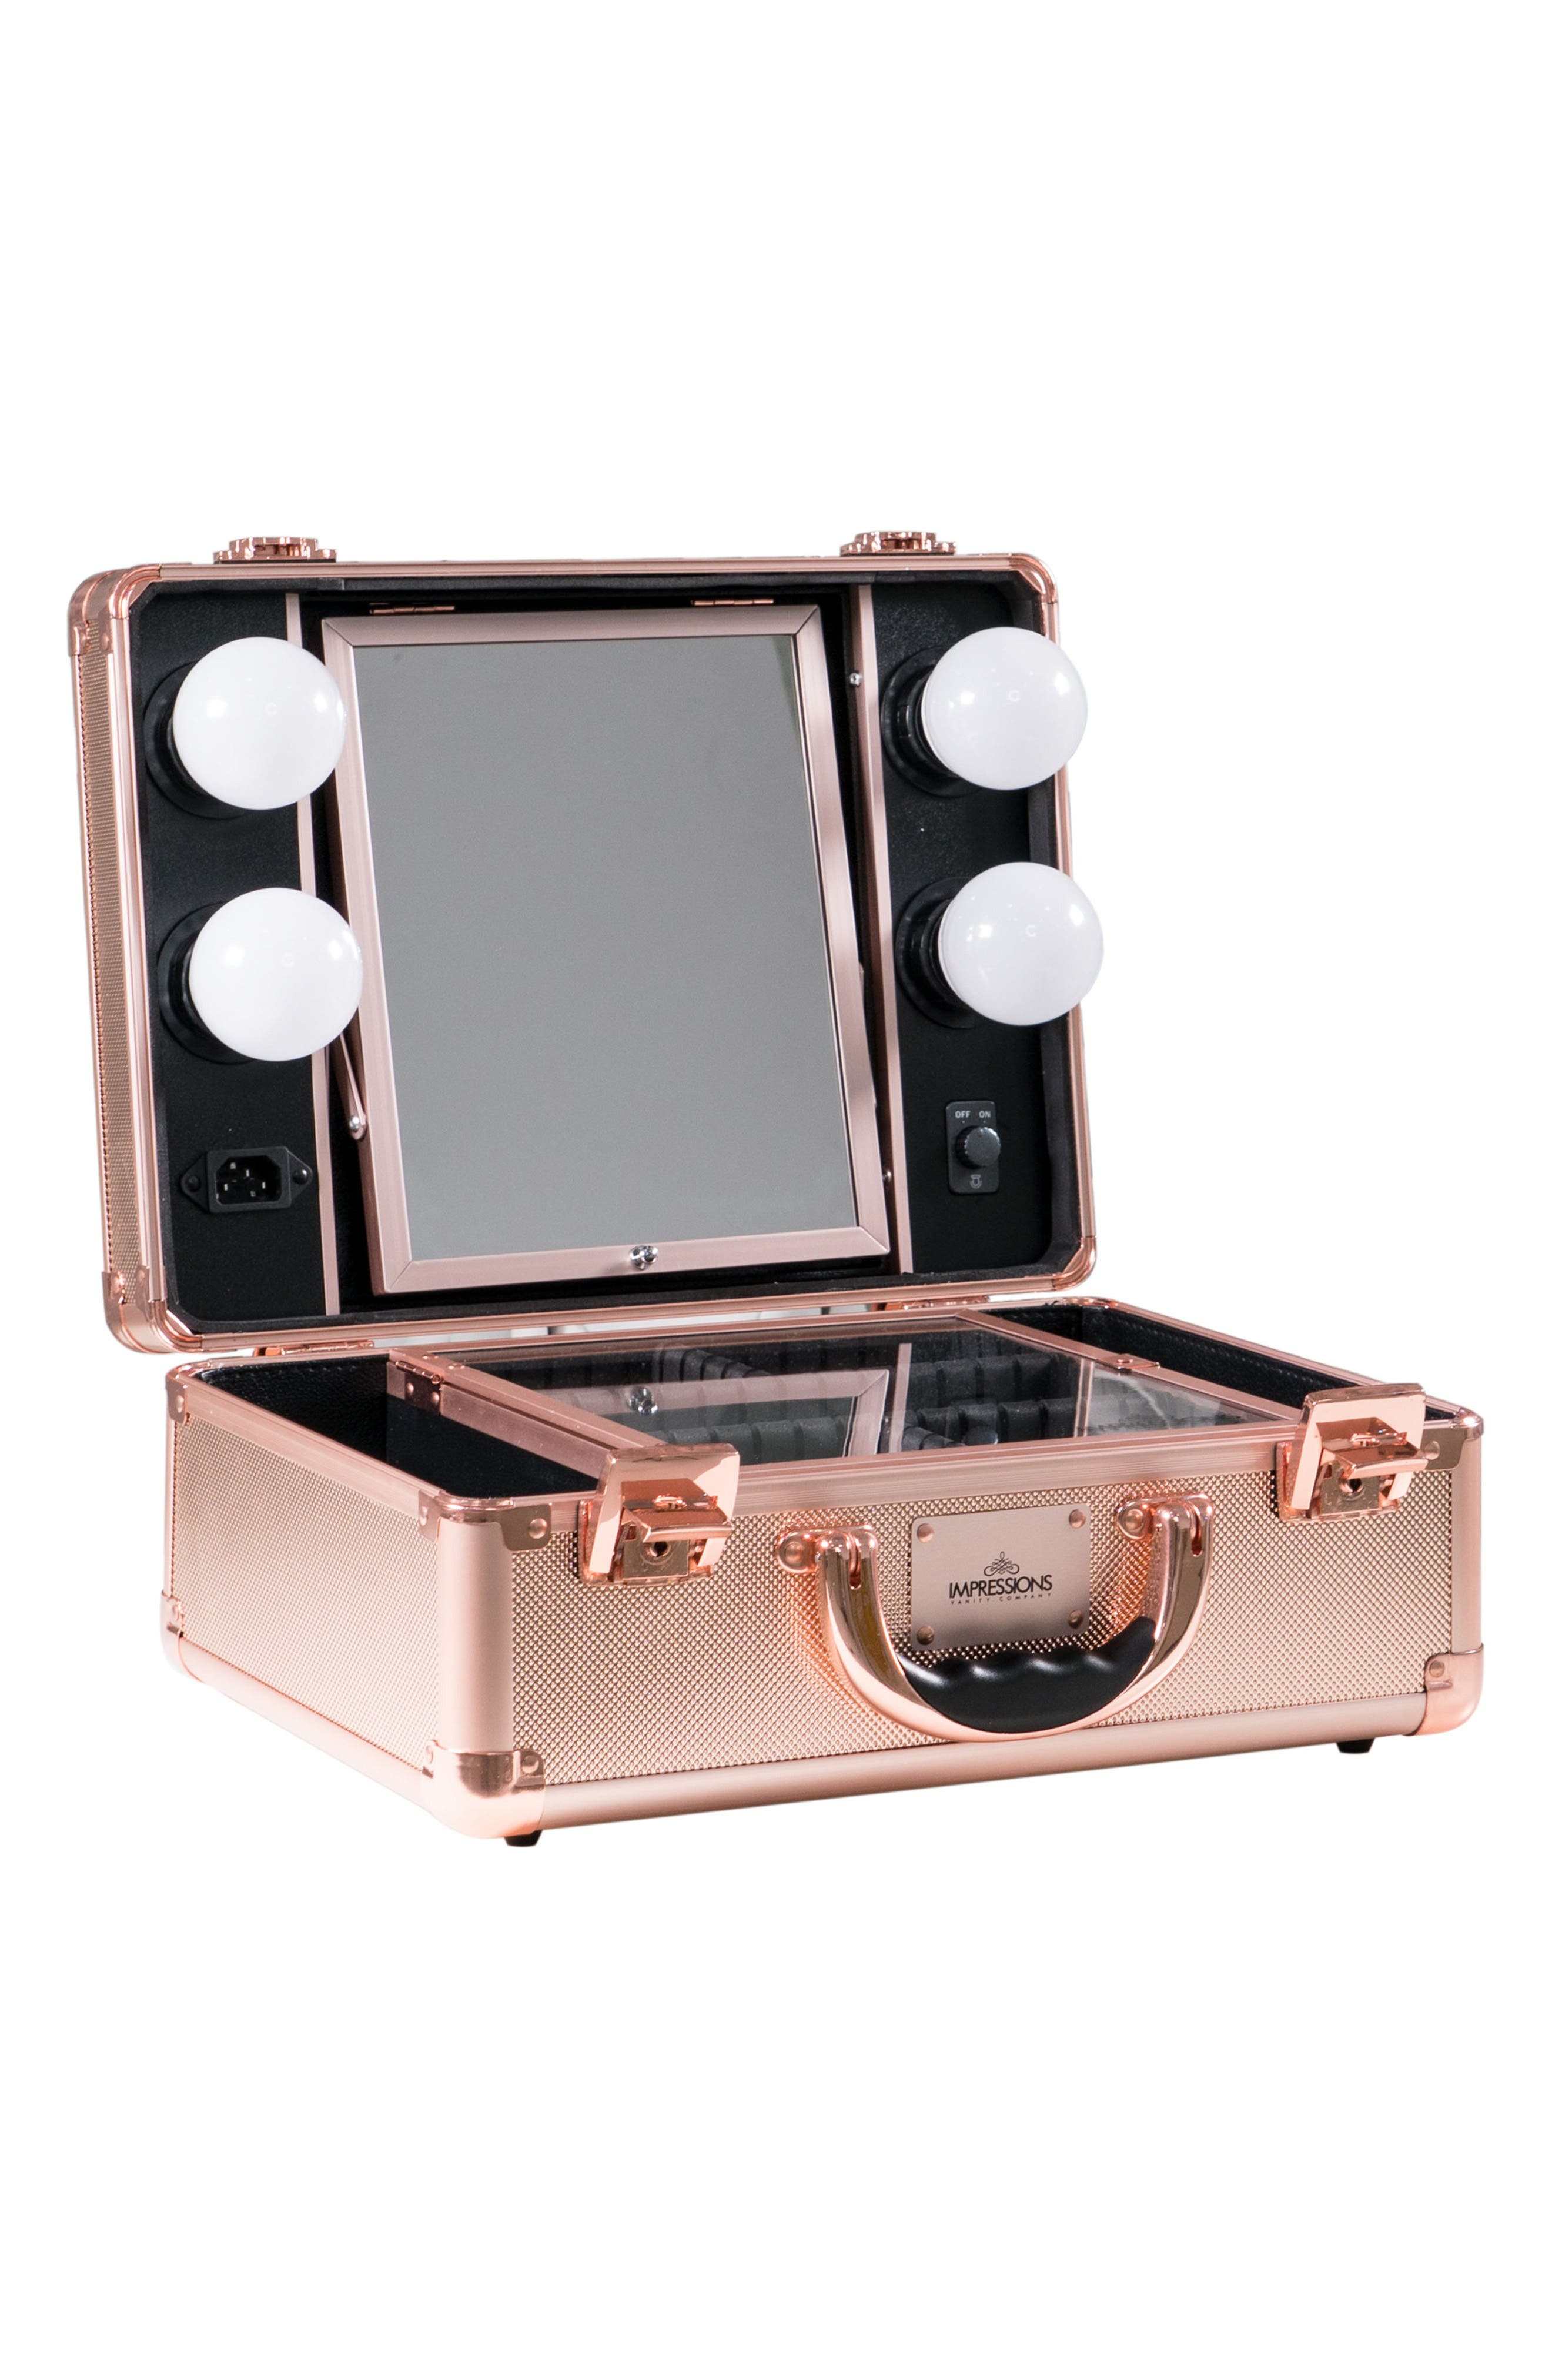 Main Image - Impressions Vanity Co. SlayCase™ Vanity Travel Case